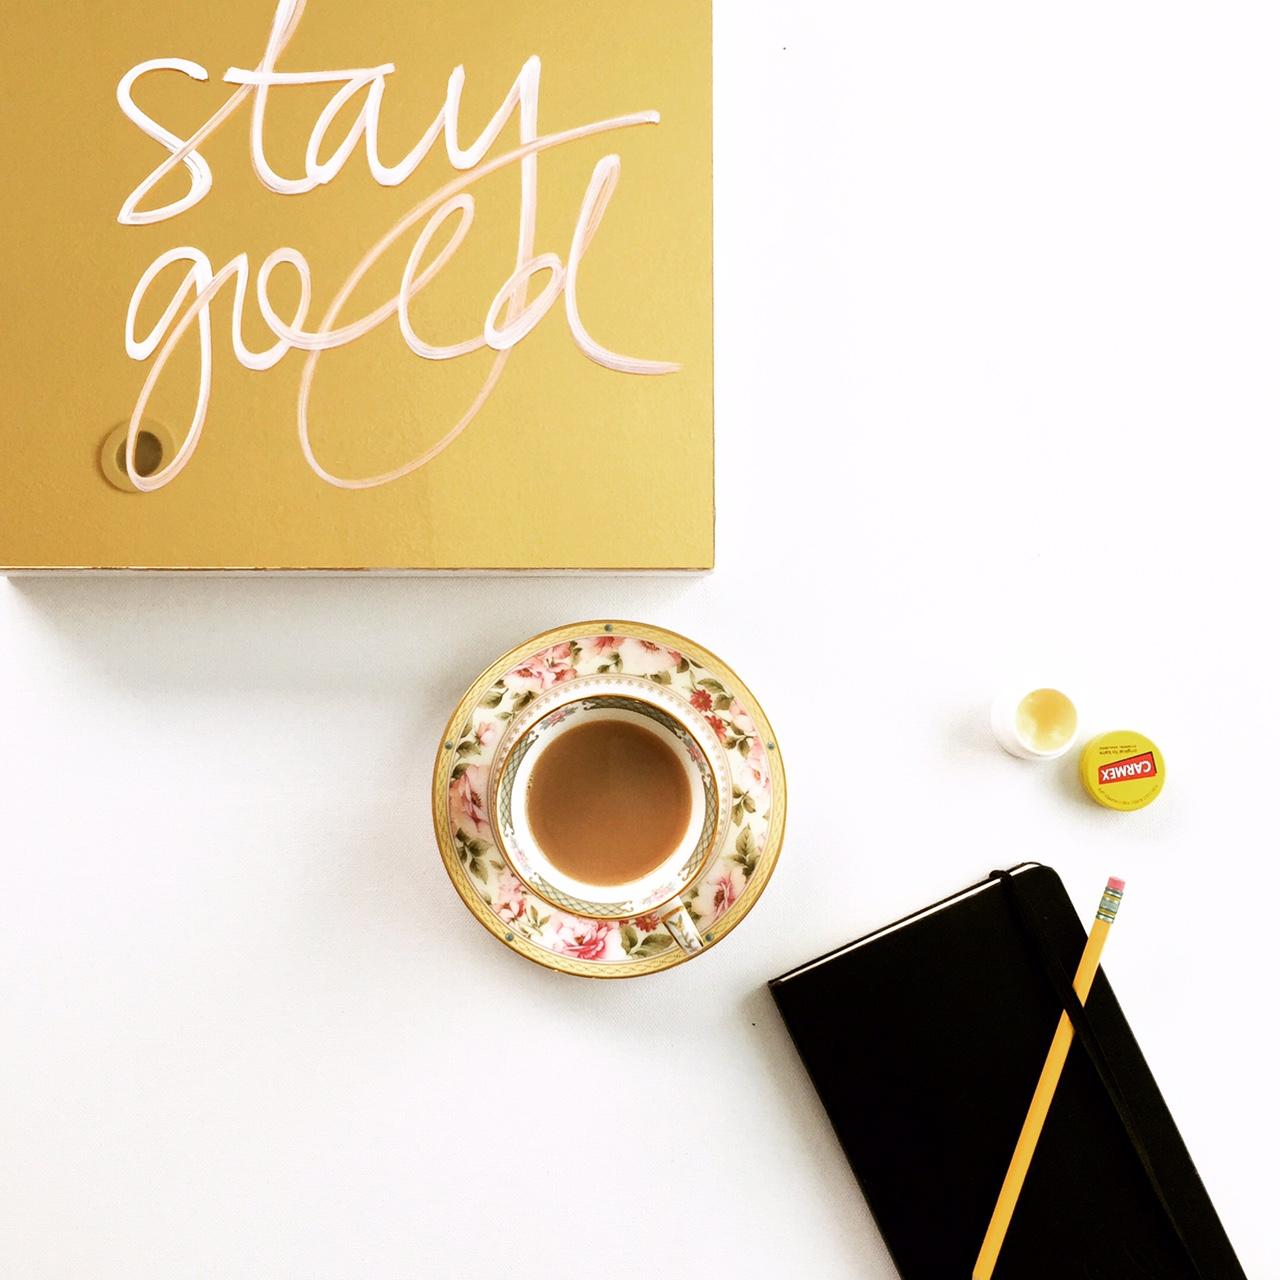 Laura Ricciardi's stay gold painting from xolaura.com